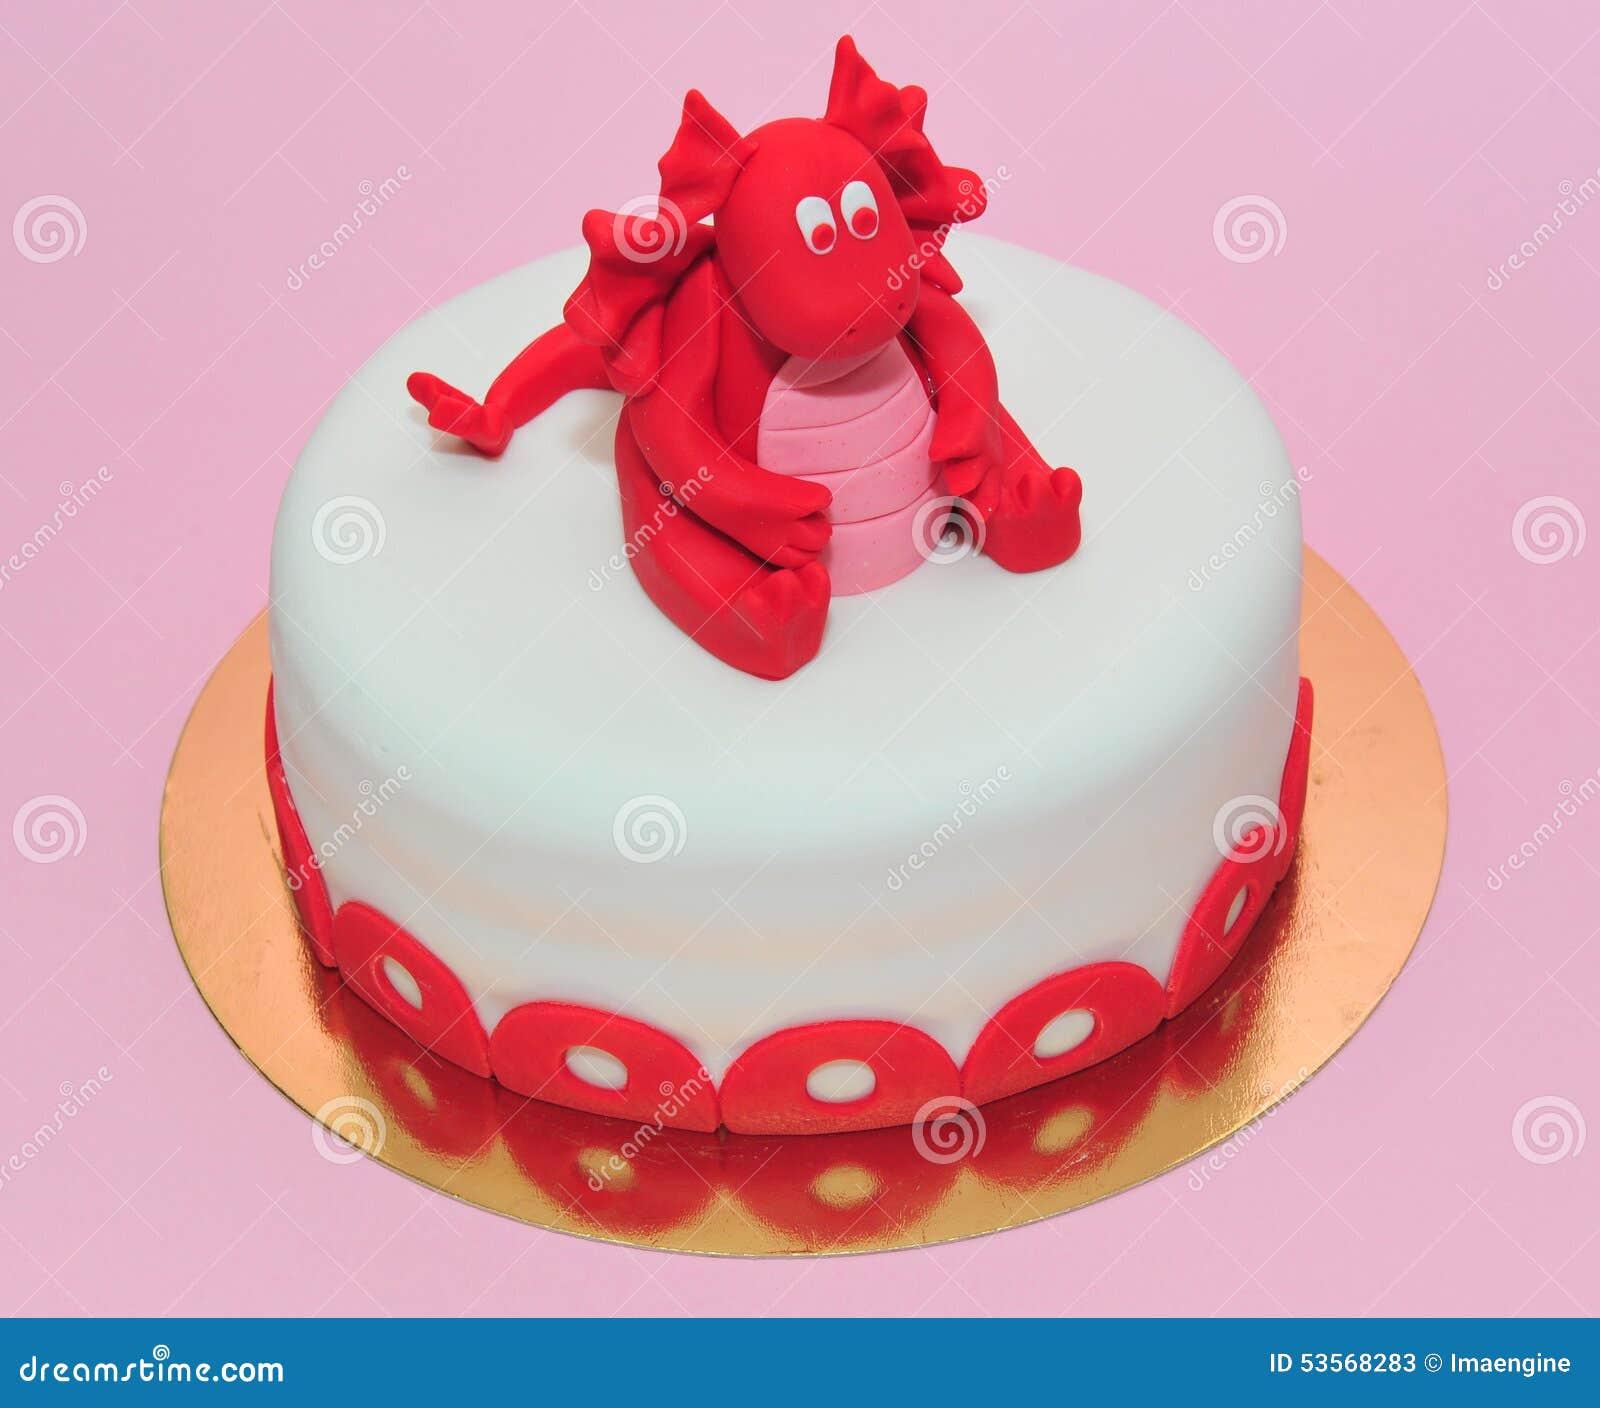 Surprising Red Baby Dragon Birthday Cake Stock Image Image Of Fondant Personalised Birthday Cards Veneteletsinfo